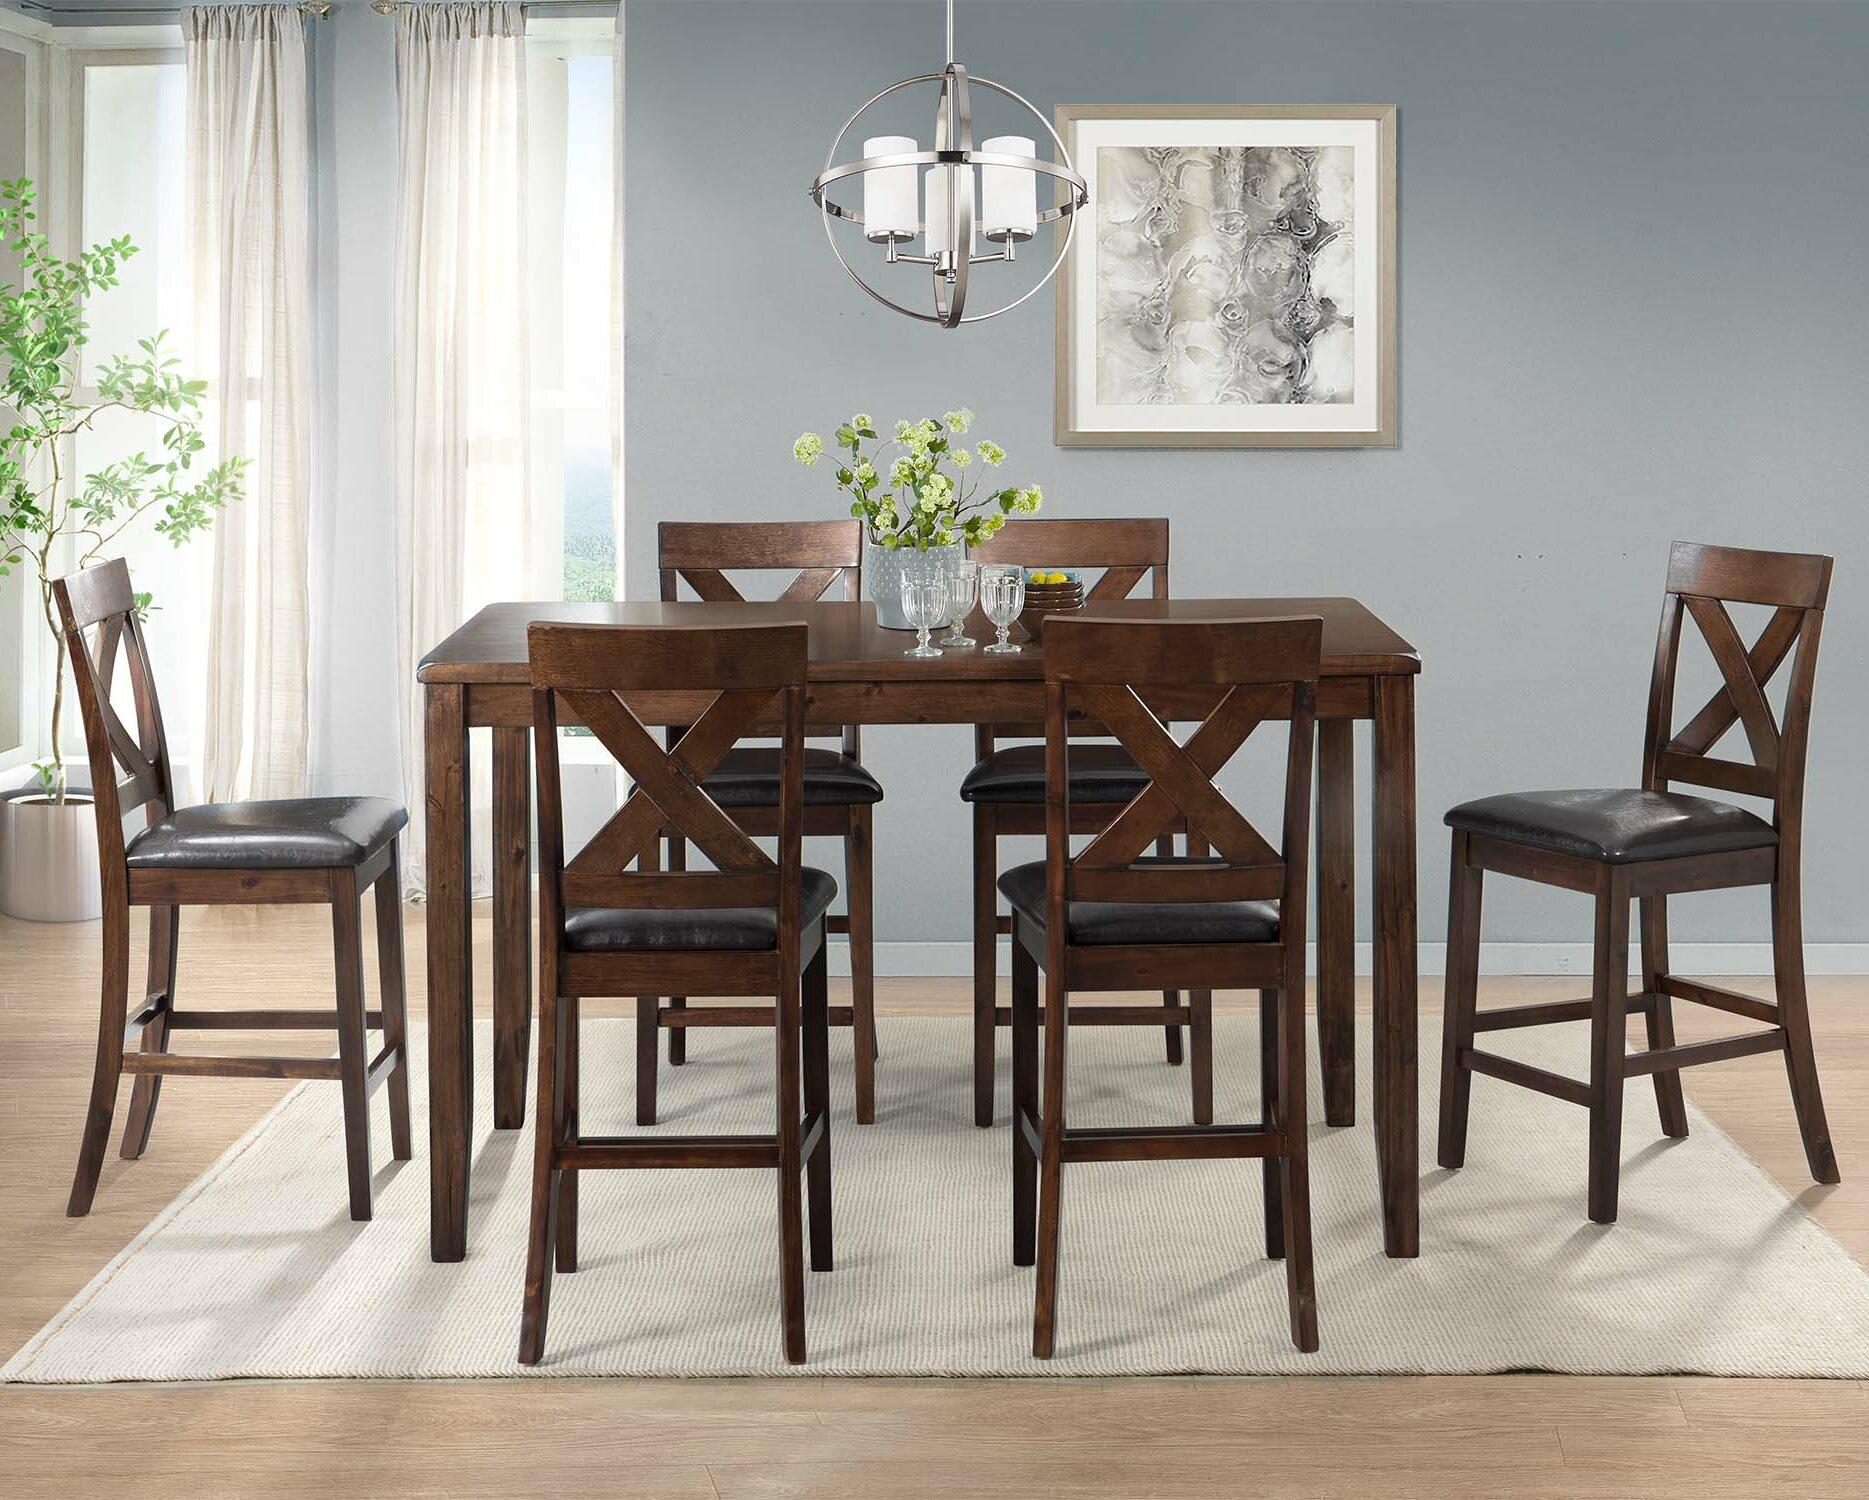 Darby Home Co Makaila 7 Piece Counter Height Dining Set U0026 Reviews   Wayfair